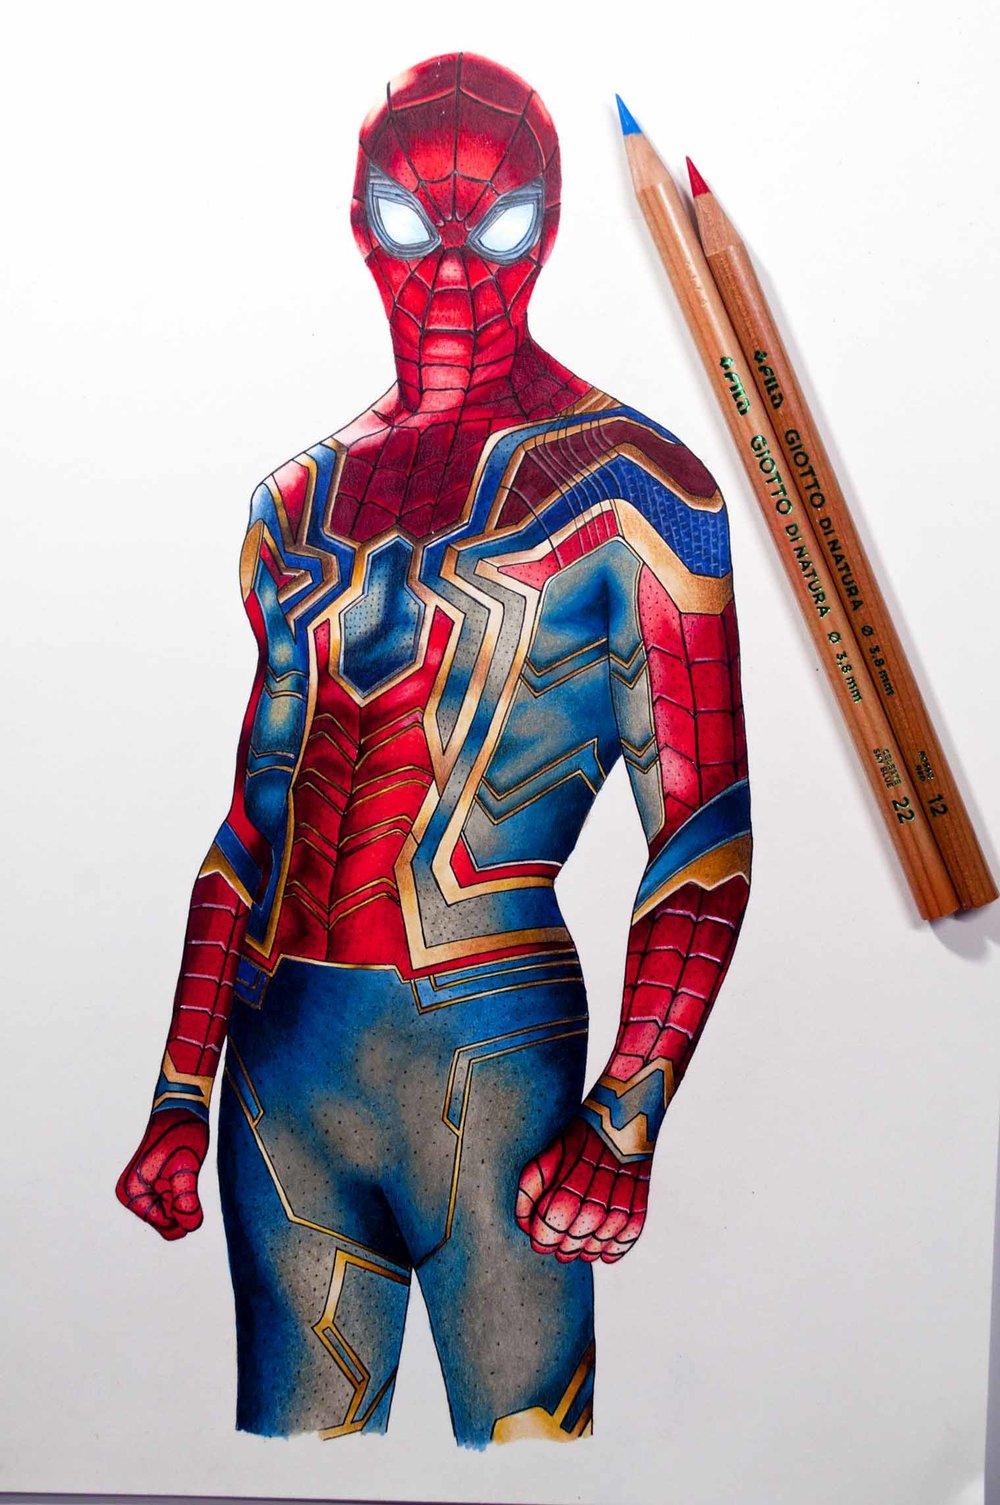 Second Spiderman Final Image.jpg